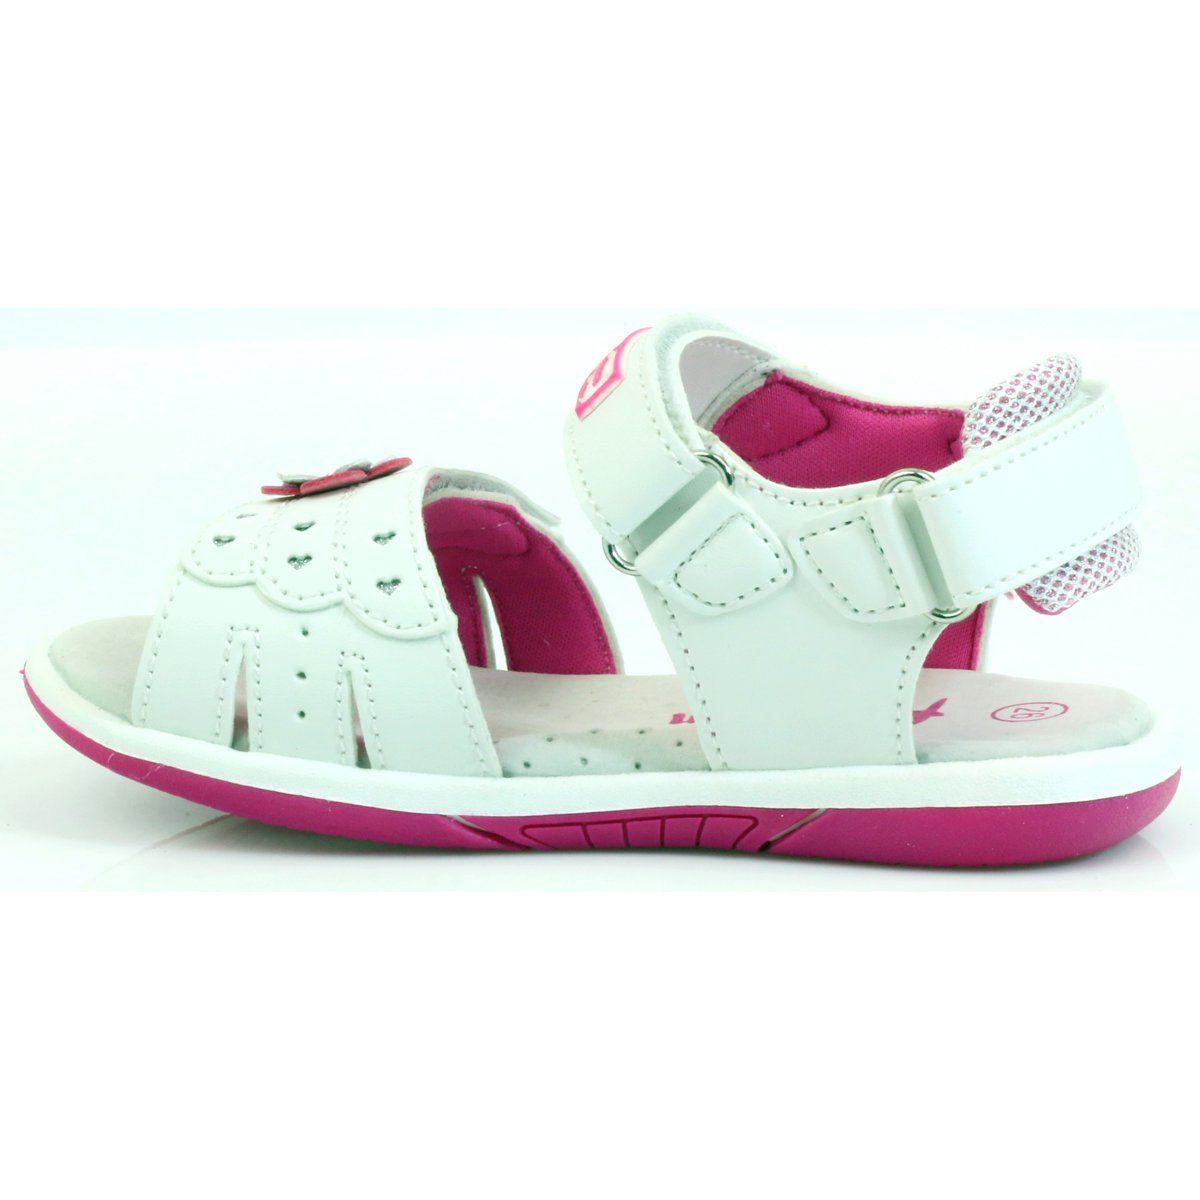 American Club Buty Dzieciece Sandalki Z Wkladka Skorzana American 93606 Rozowe Biale Kid Shoes Leather Summer Shoes